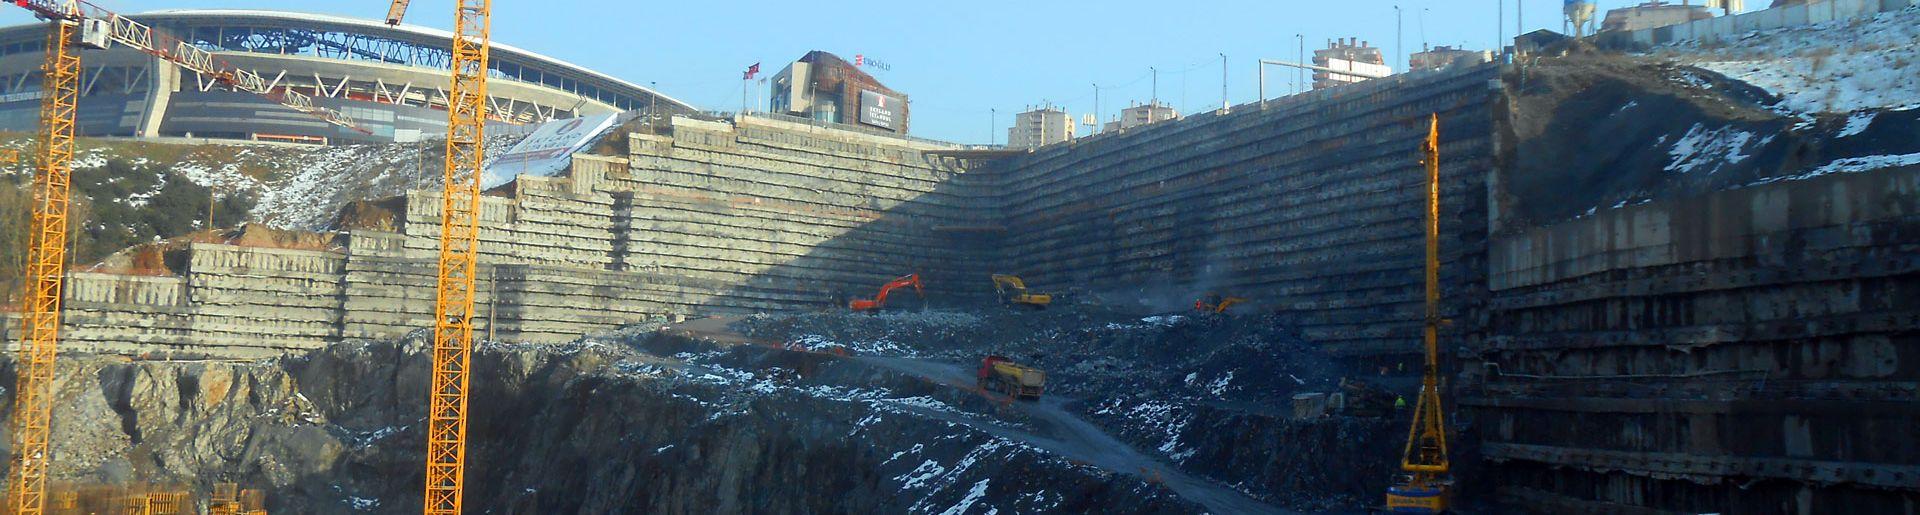 Eroğlu Sykland Project